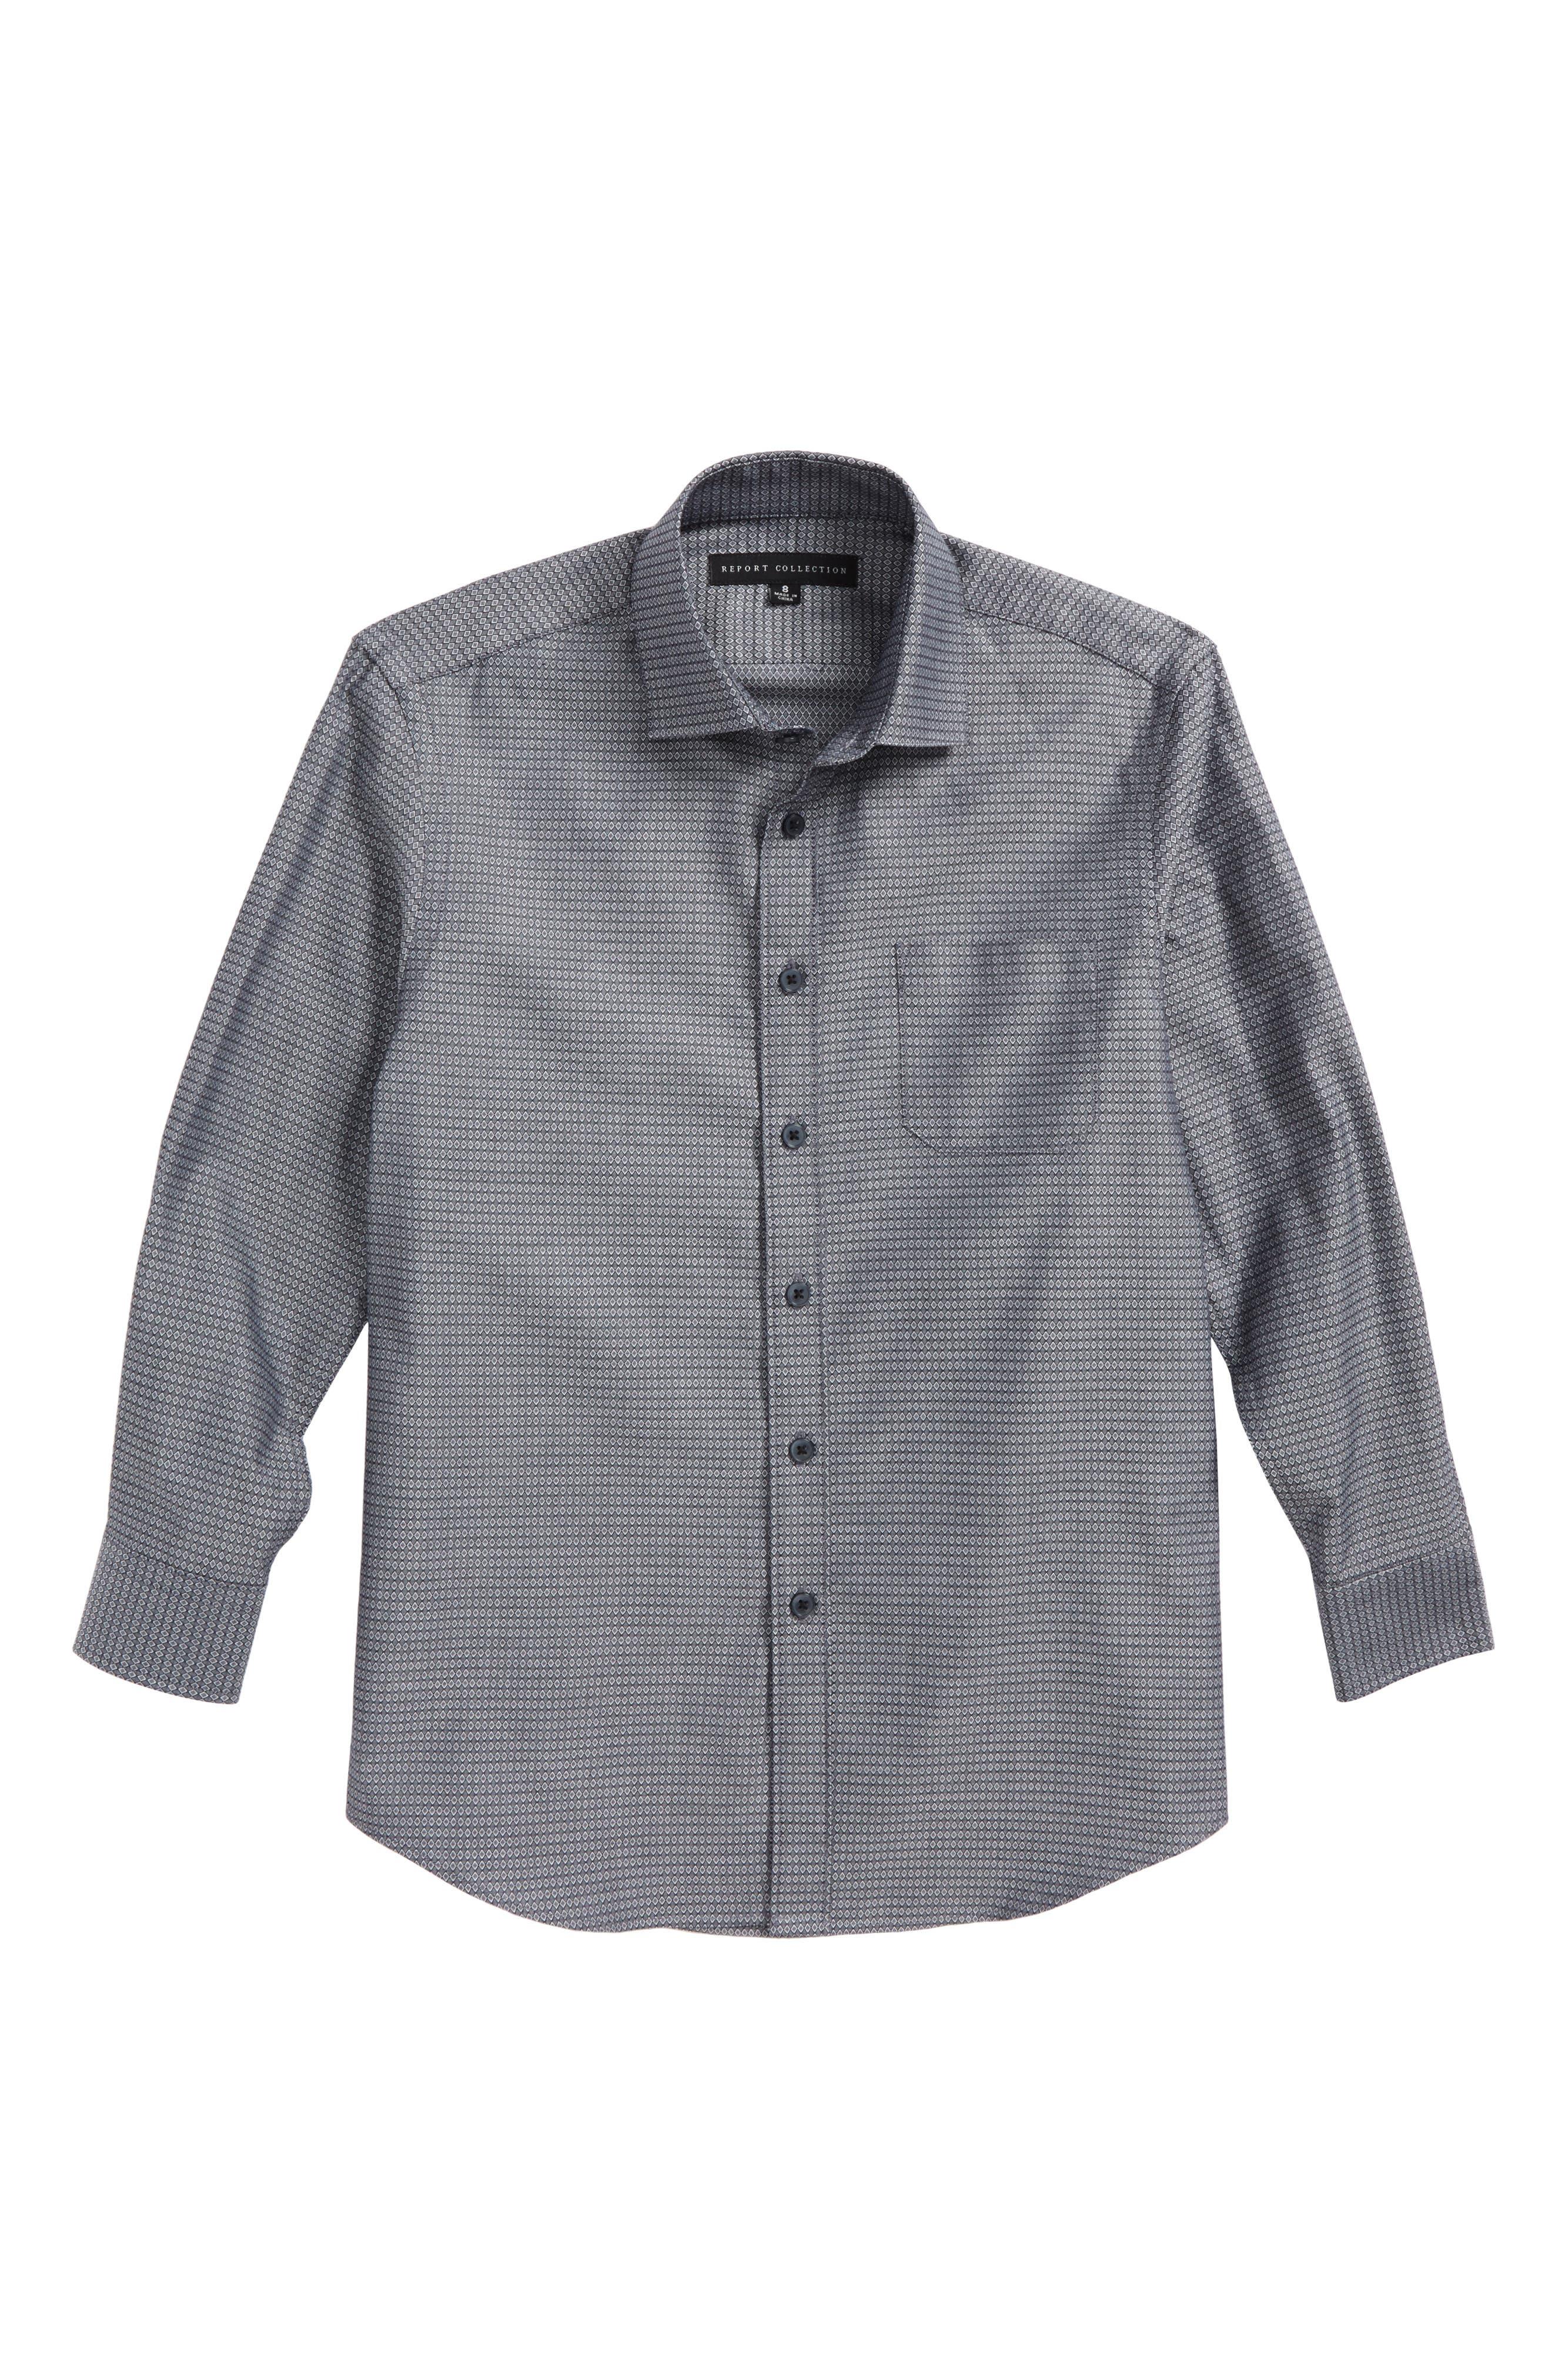 Diamond Grid Dress Shirt,                         Main,                         color, Grey